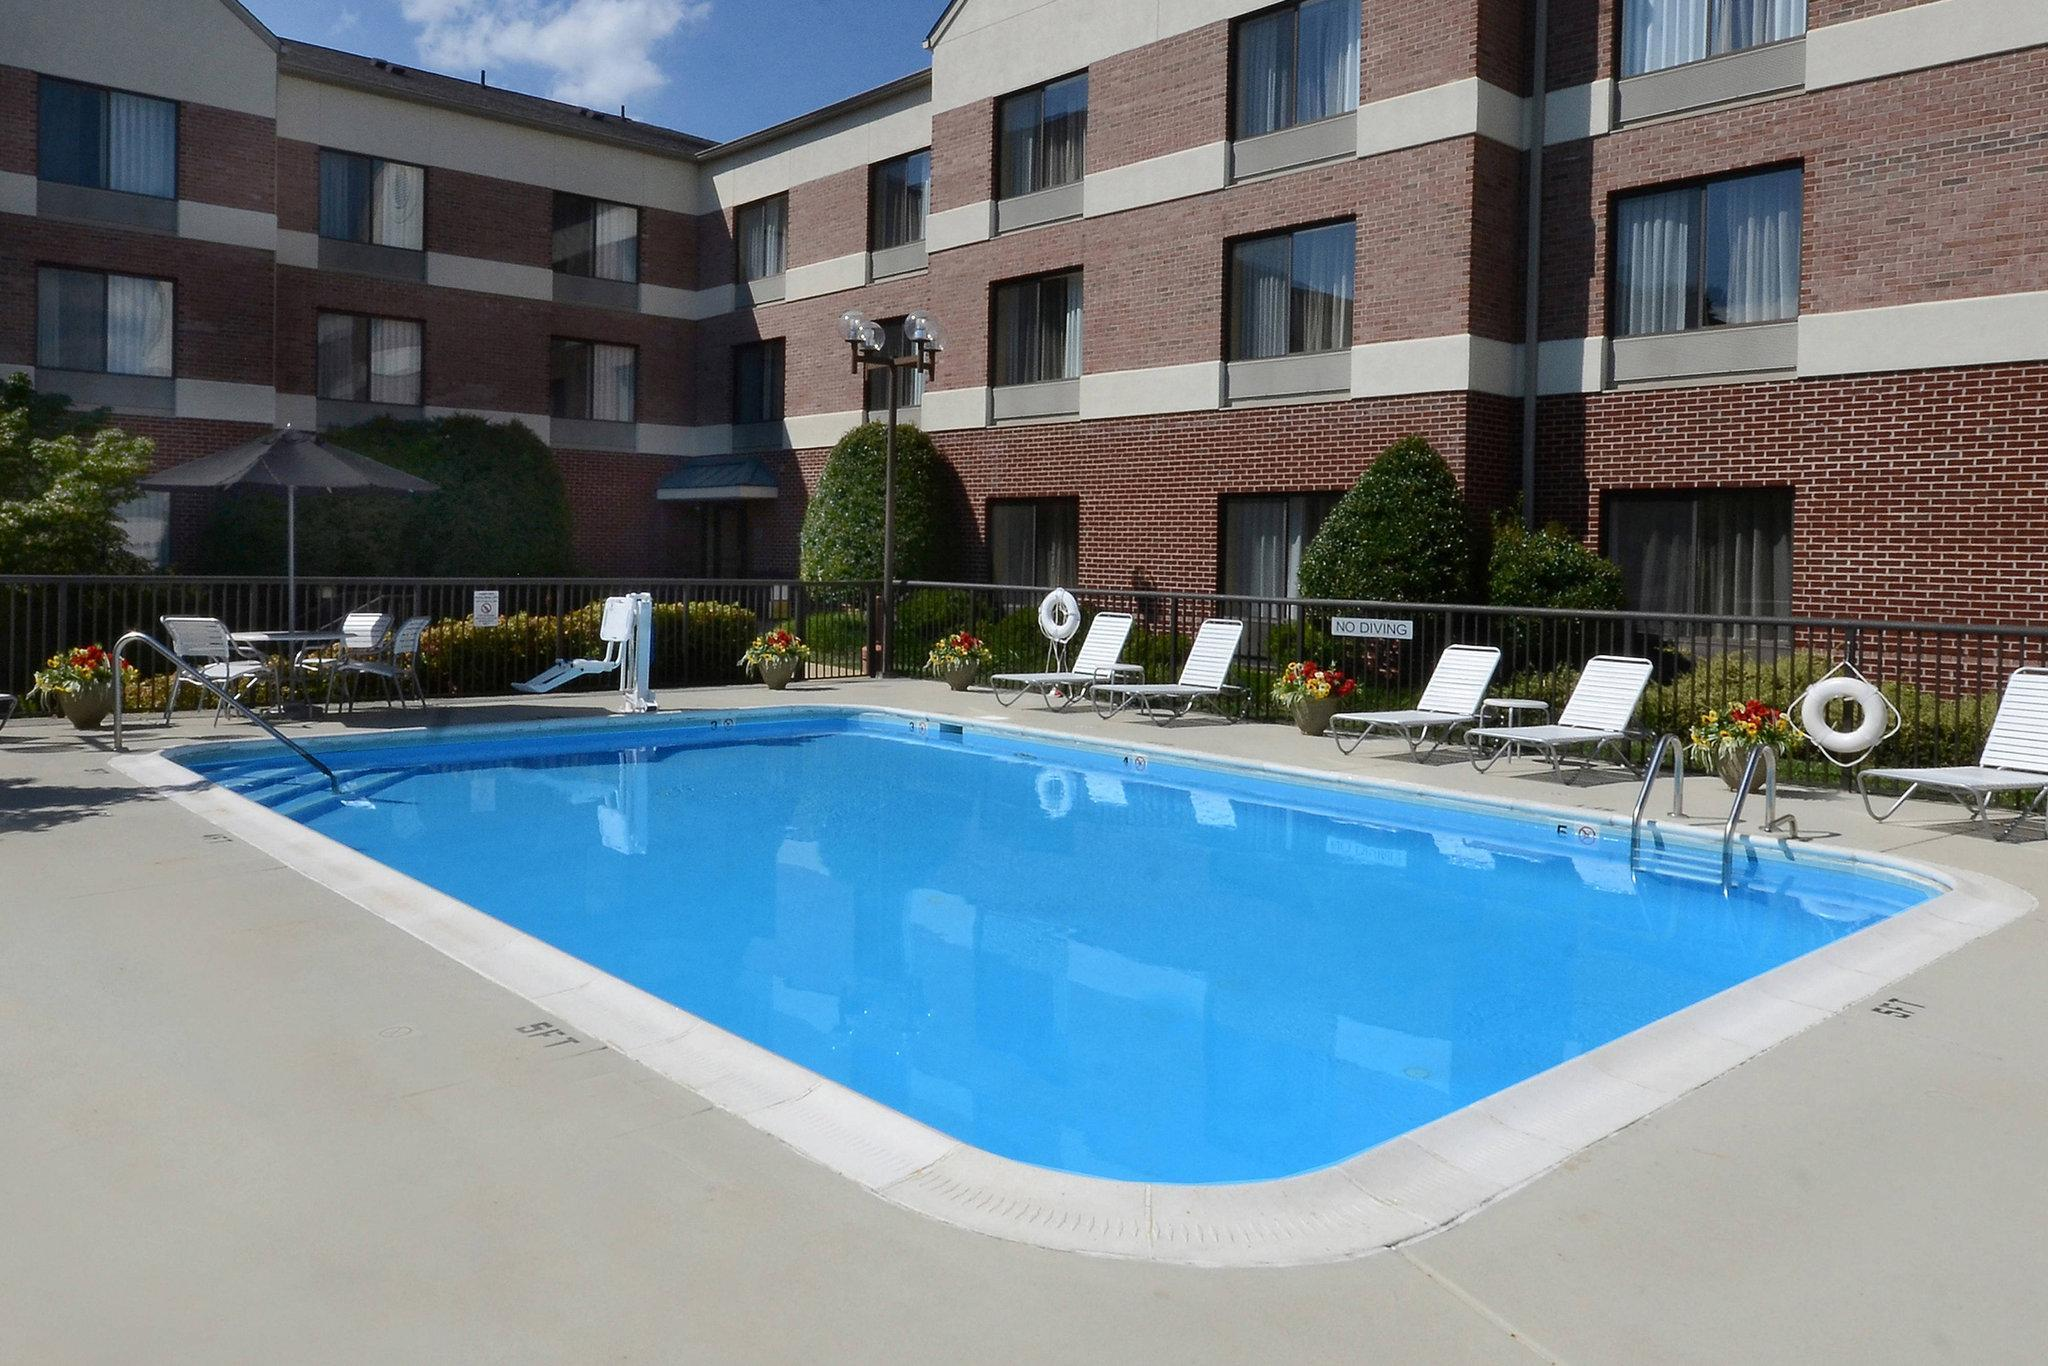 Fairfield Inn & Suites Charlottesville North, Albemarle